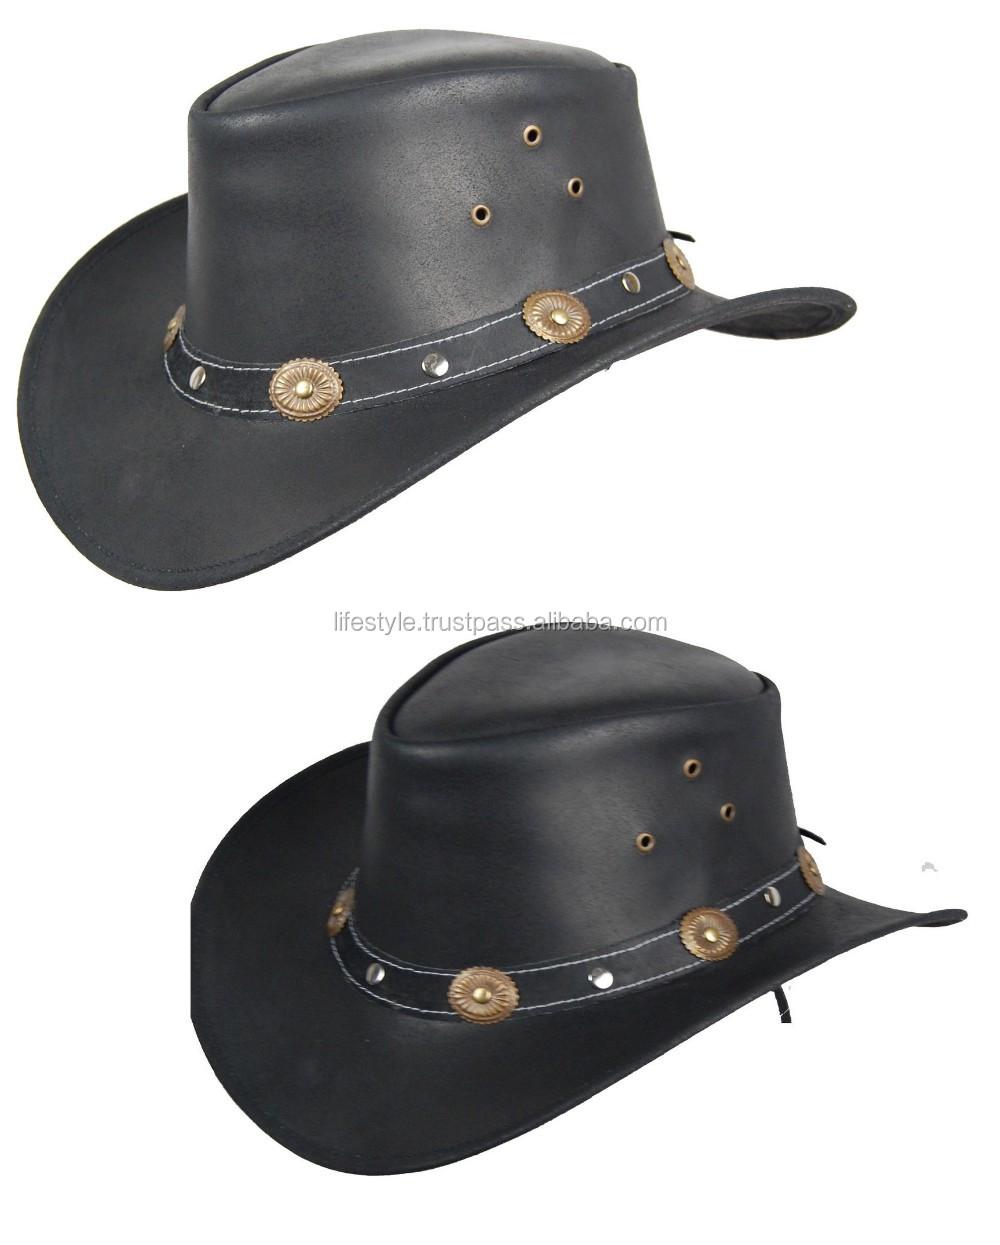 Cowboy Hat Winter Cowboy Hat Mini Cowboy Hats - Buy Orange Wool Felt ... e35f2ab6a29b